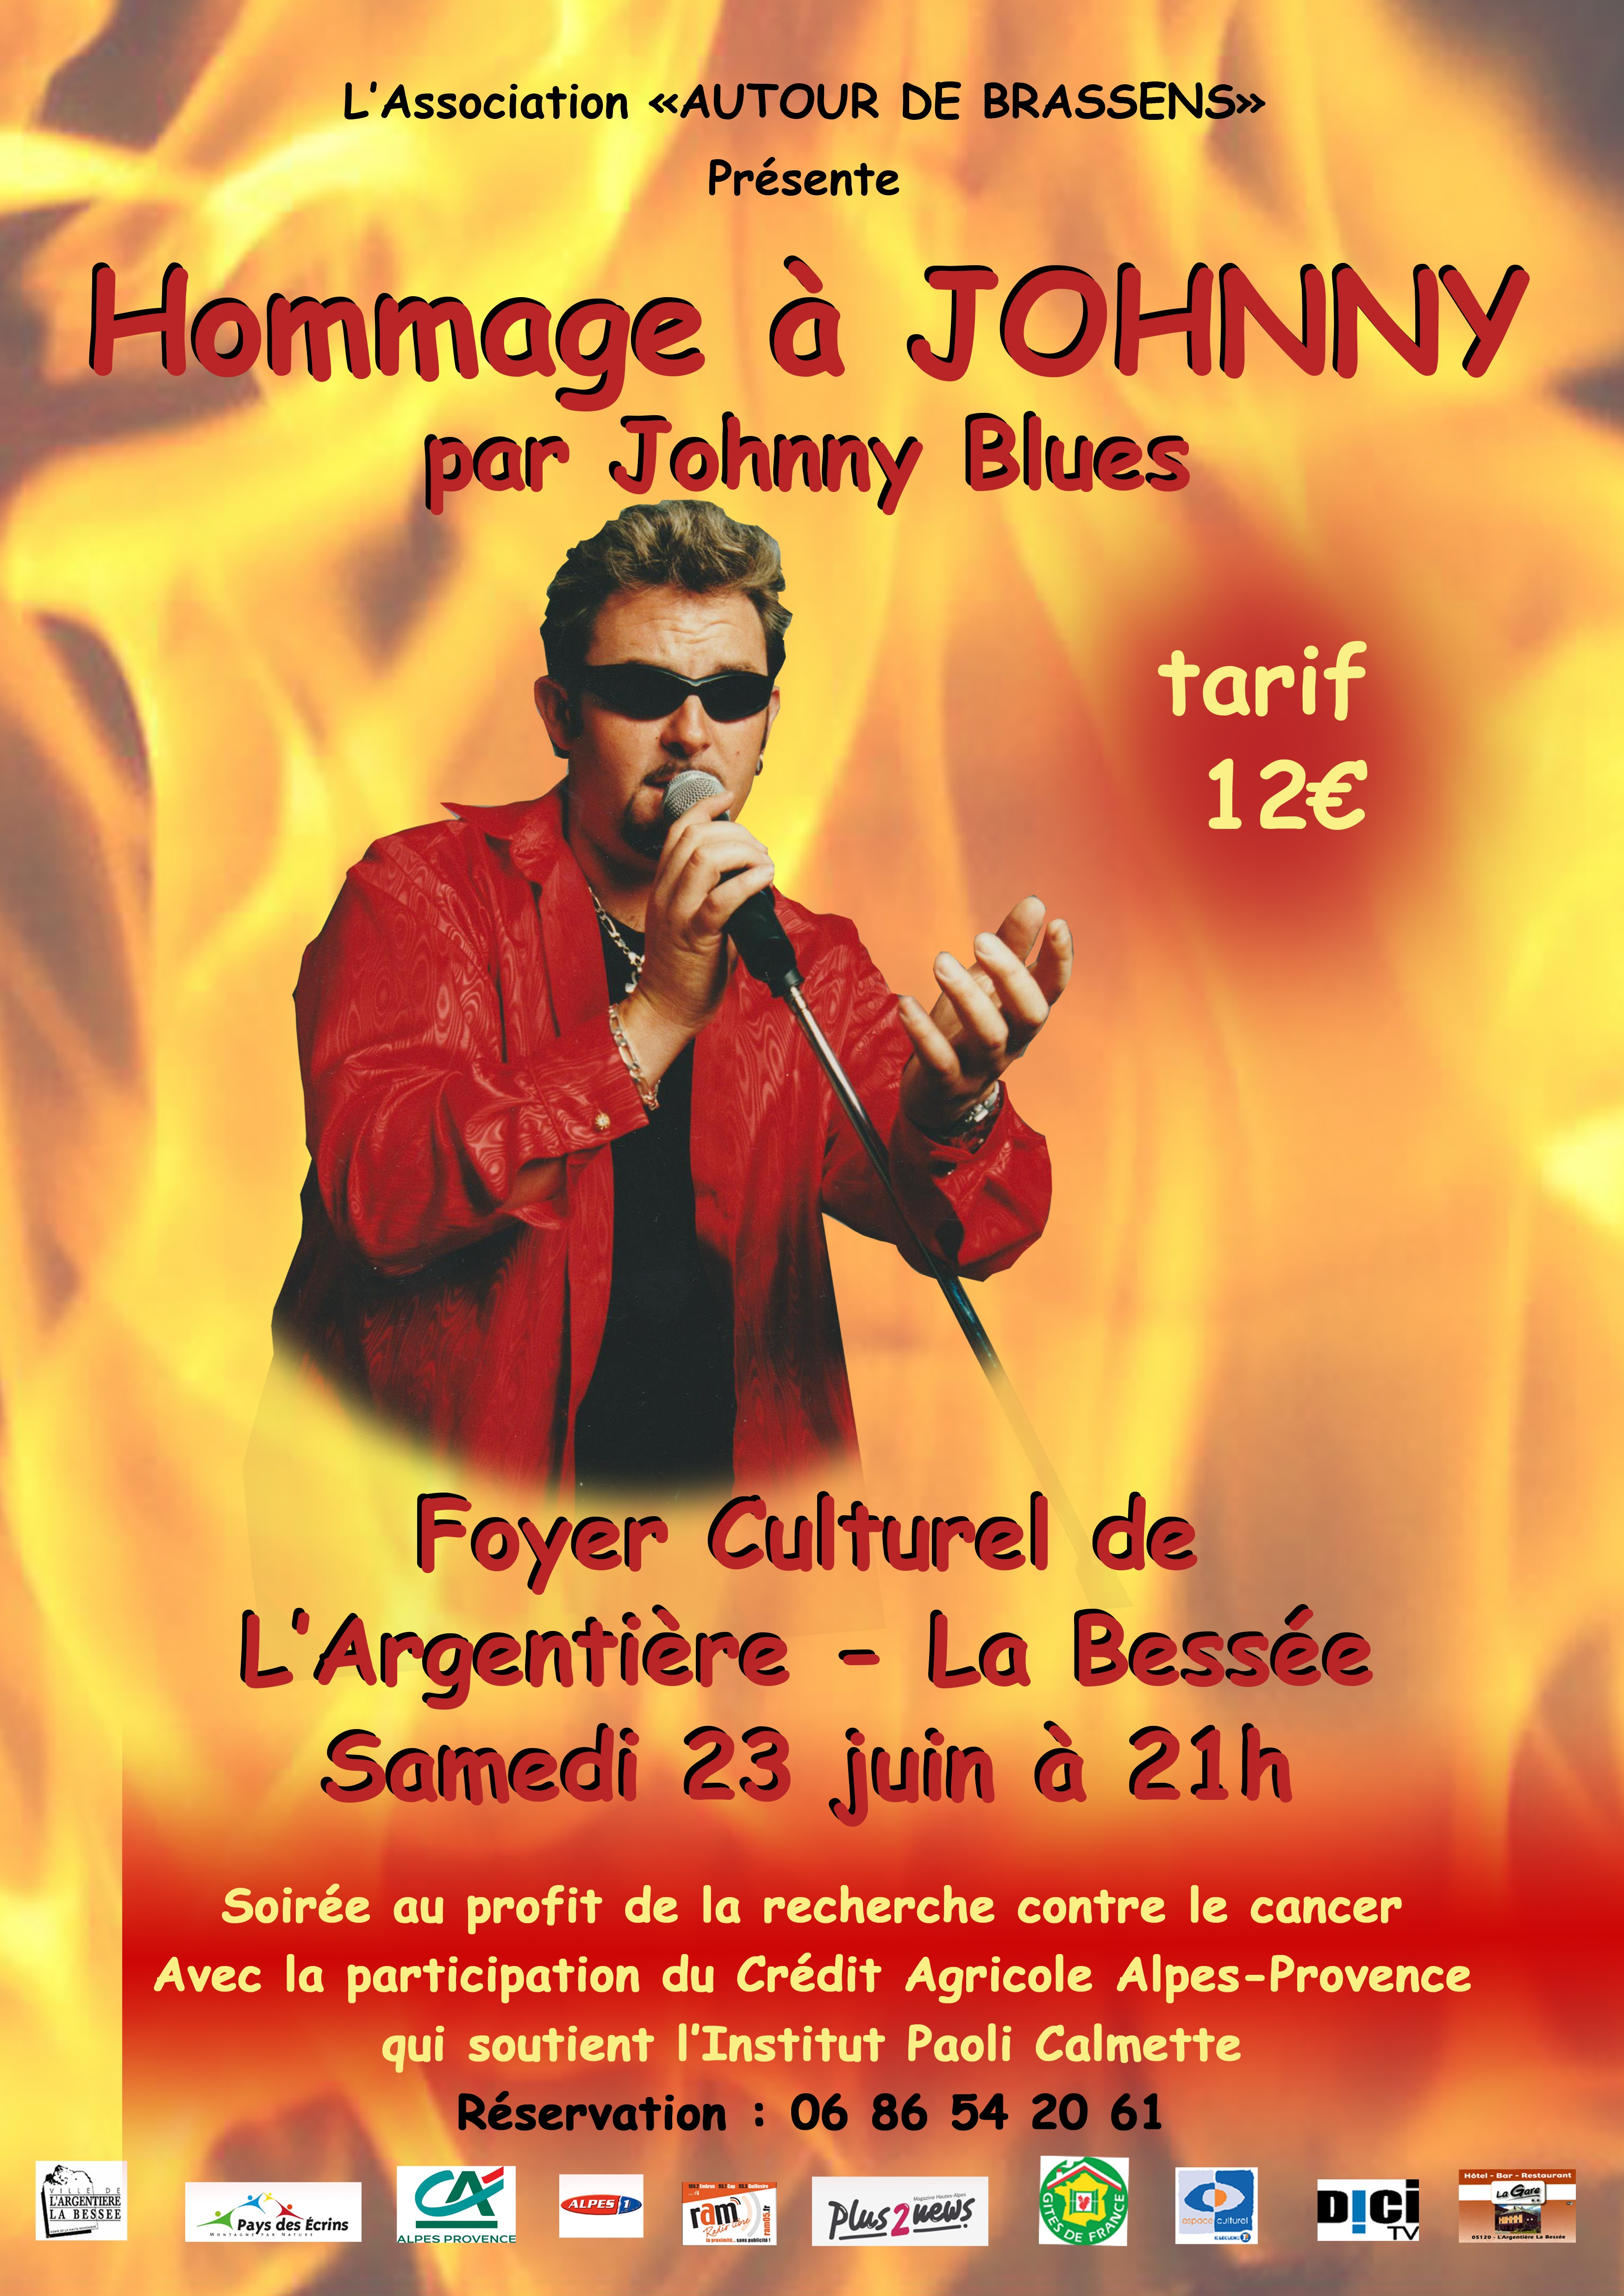 Un concert en hommage à Johnny par Johnny Blues aura lieu ce samedi !